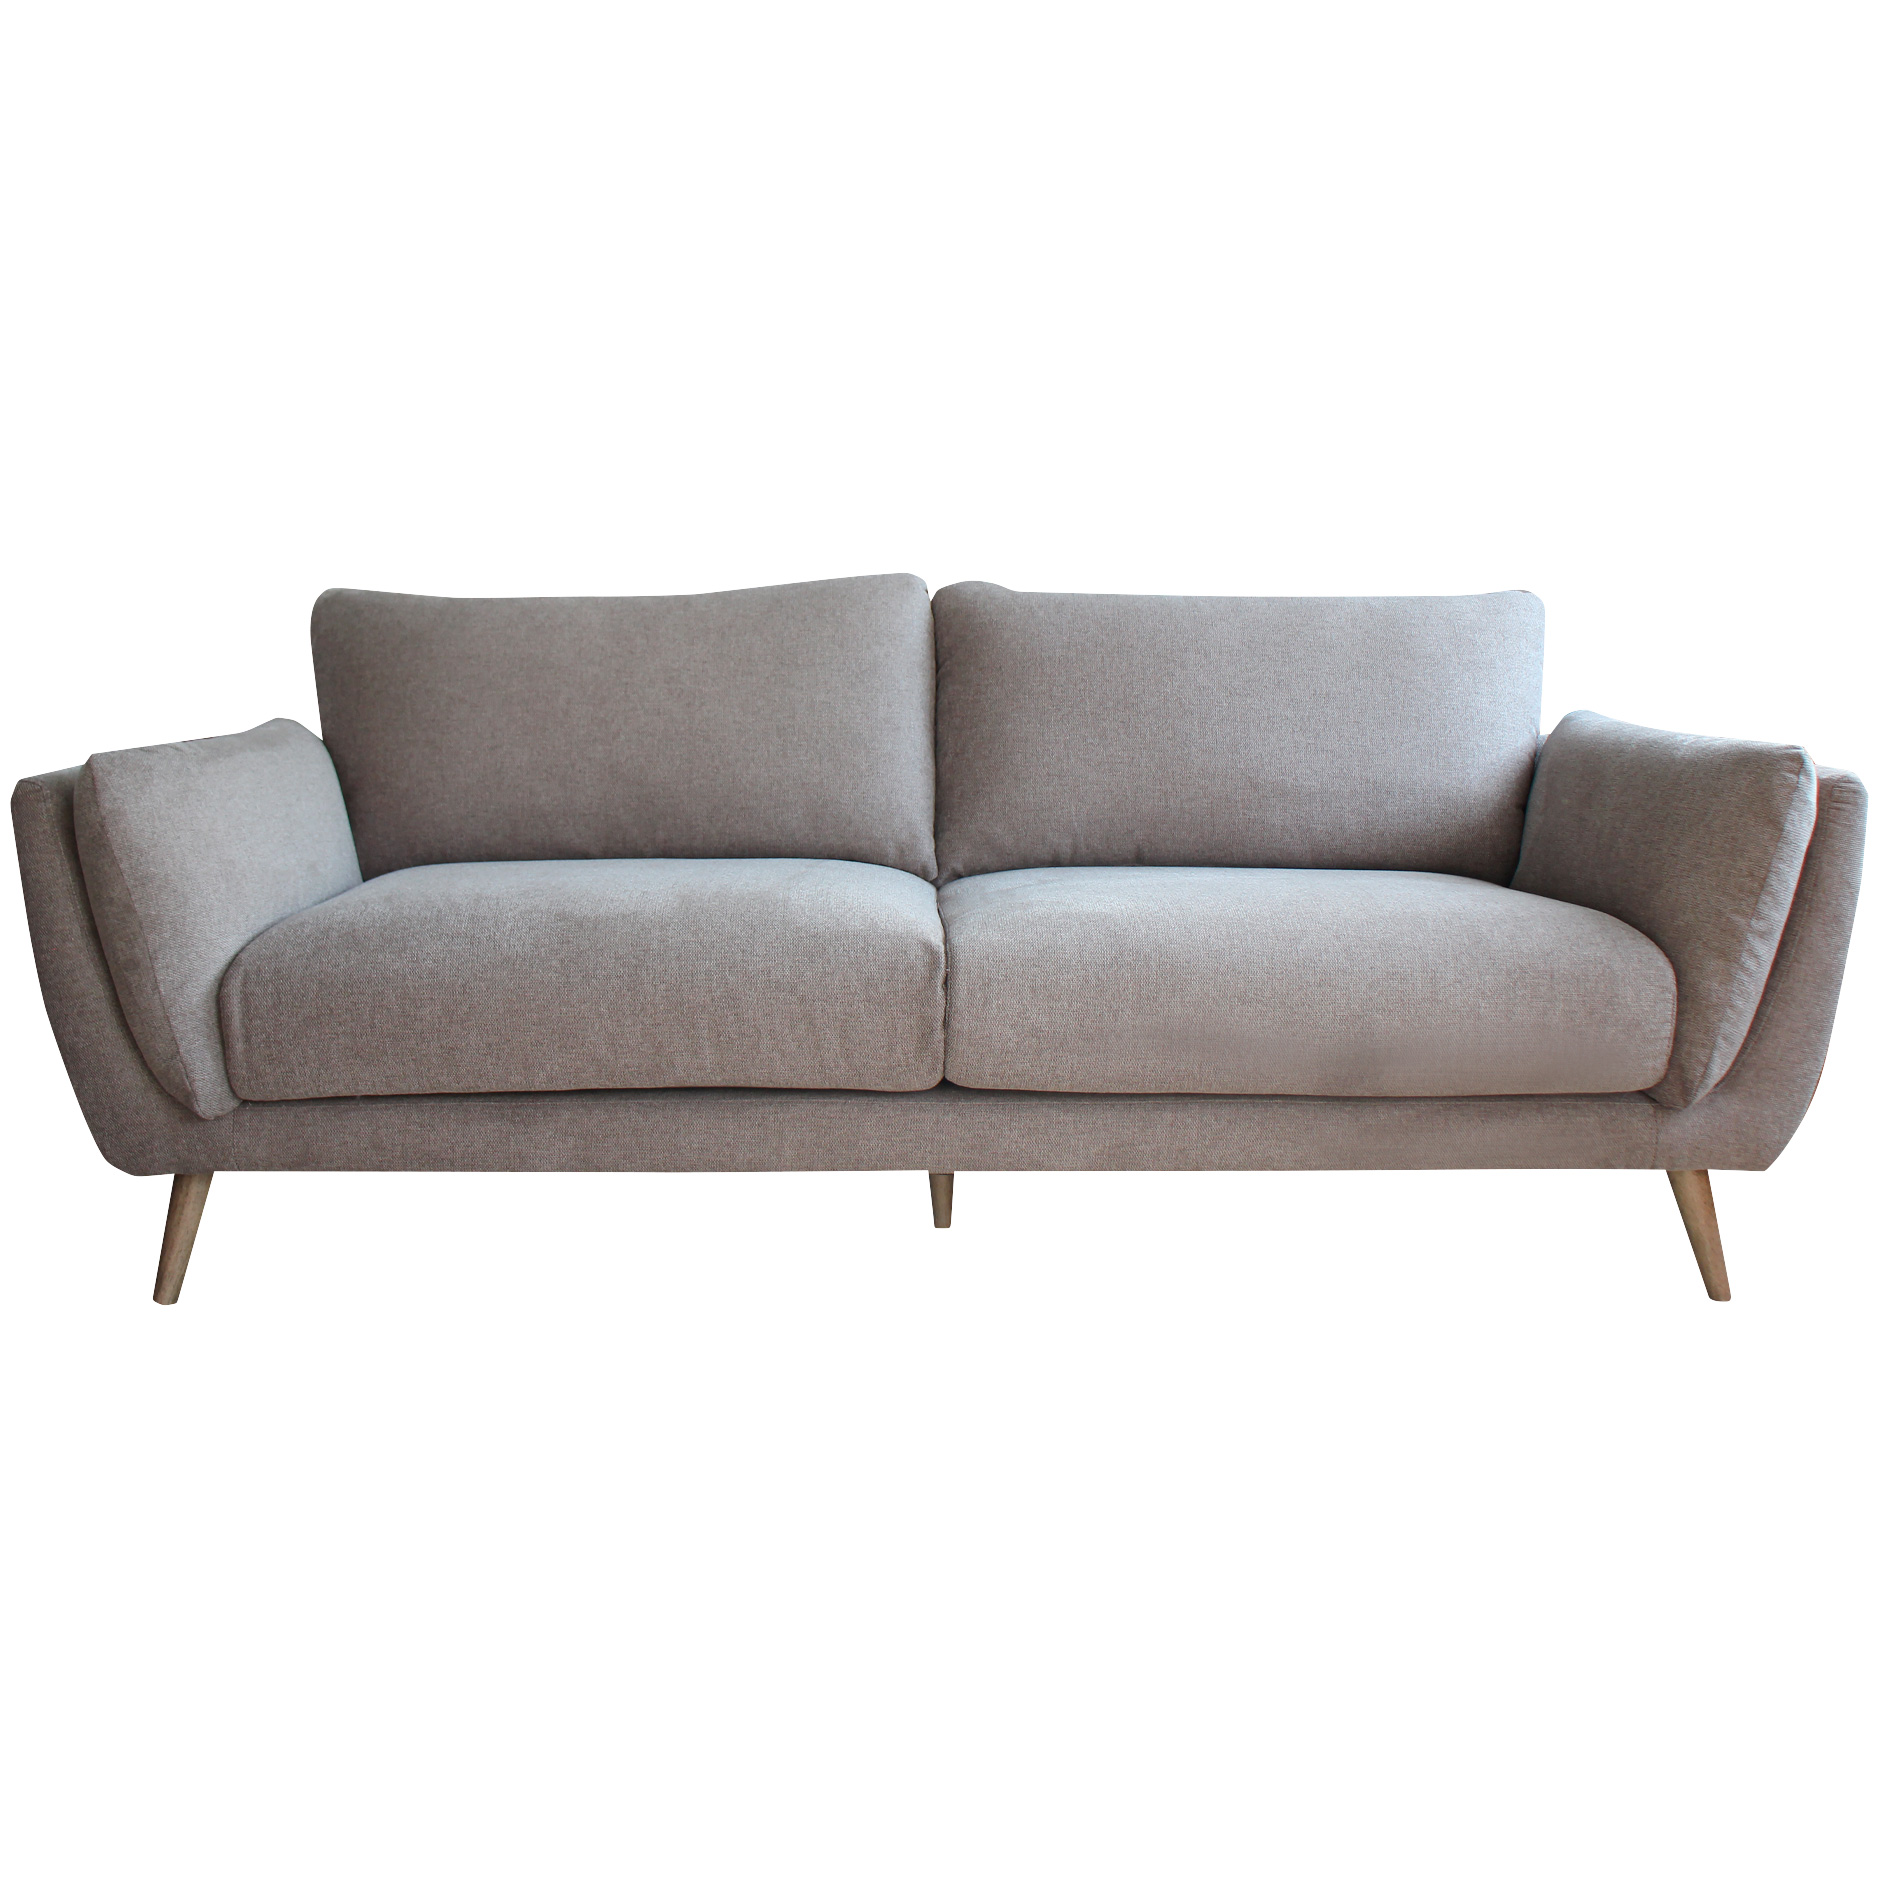 Urban Chic Upholstery | Lydia Mushroom Sofa